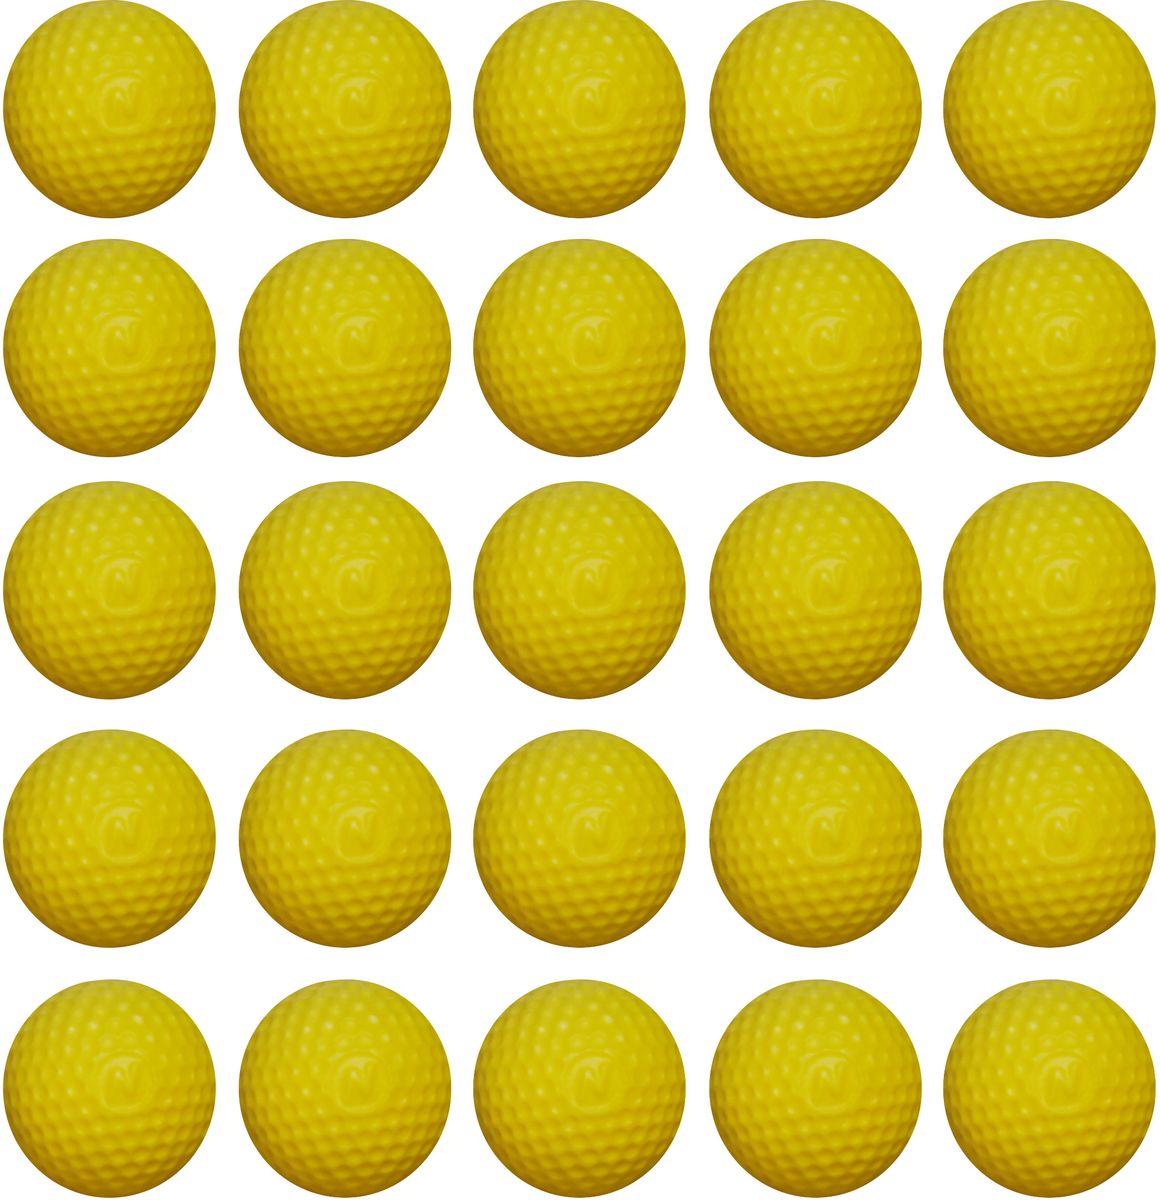 Nerf Набор шариков Rival 25 штB158925 мягких шариков для бластеров НЁРФ Райвал.